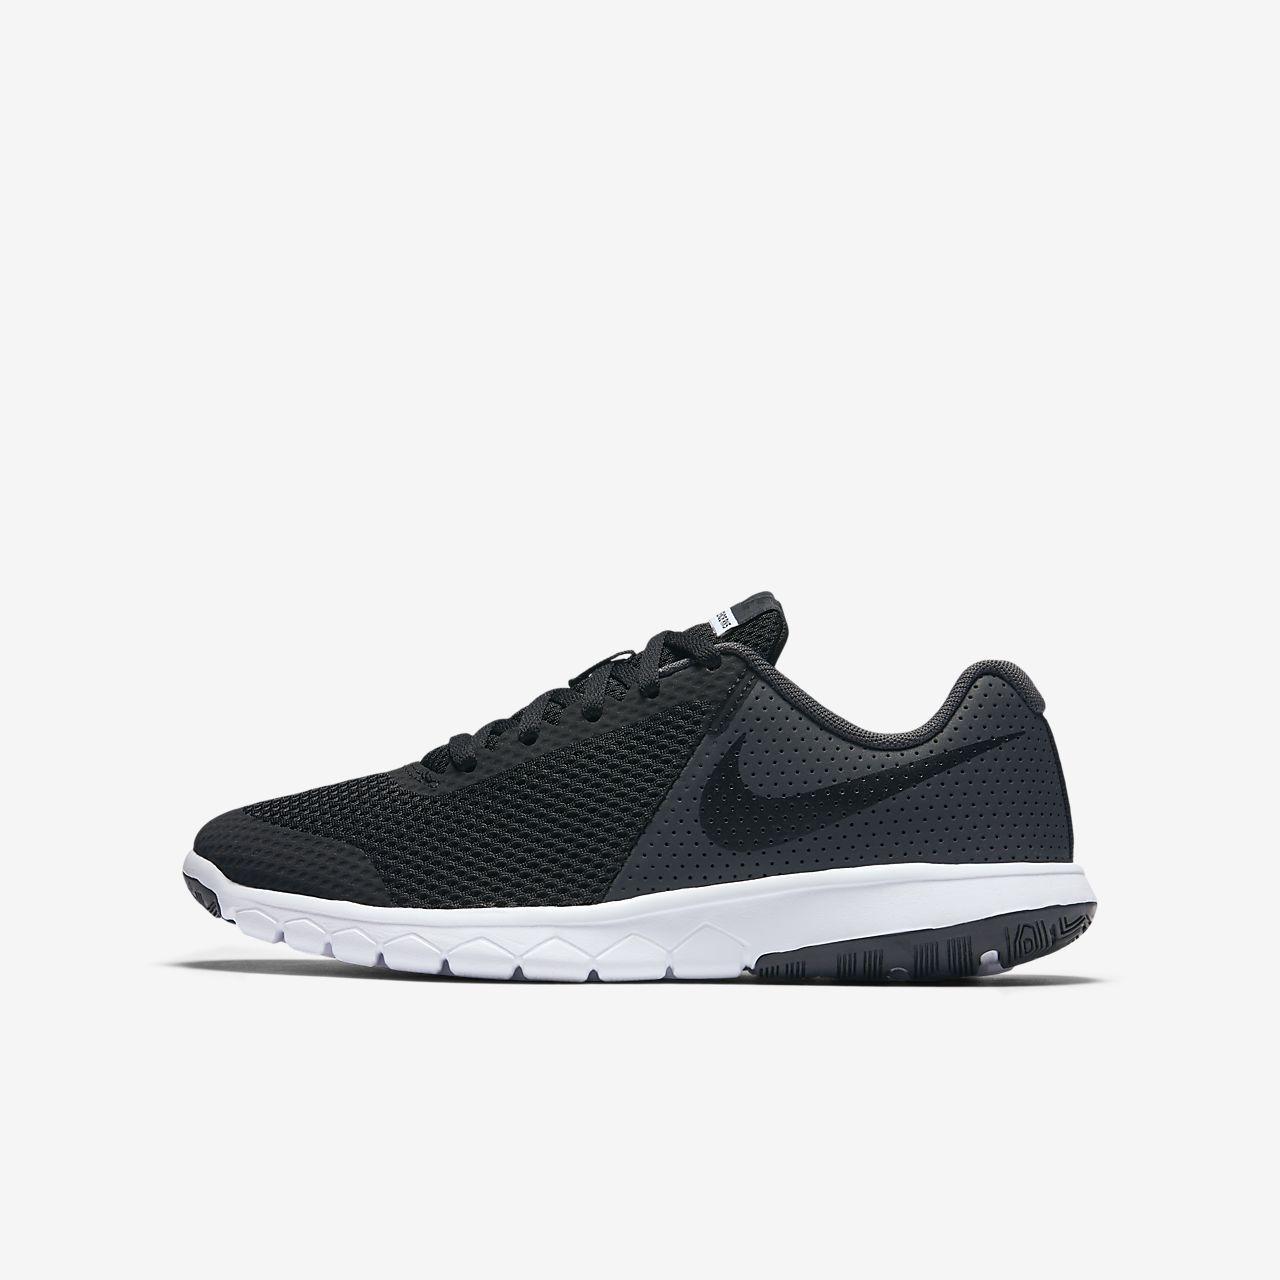 Löparsko Nike Flex Experience 5 för ungdom